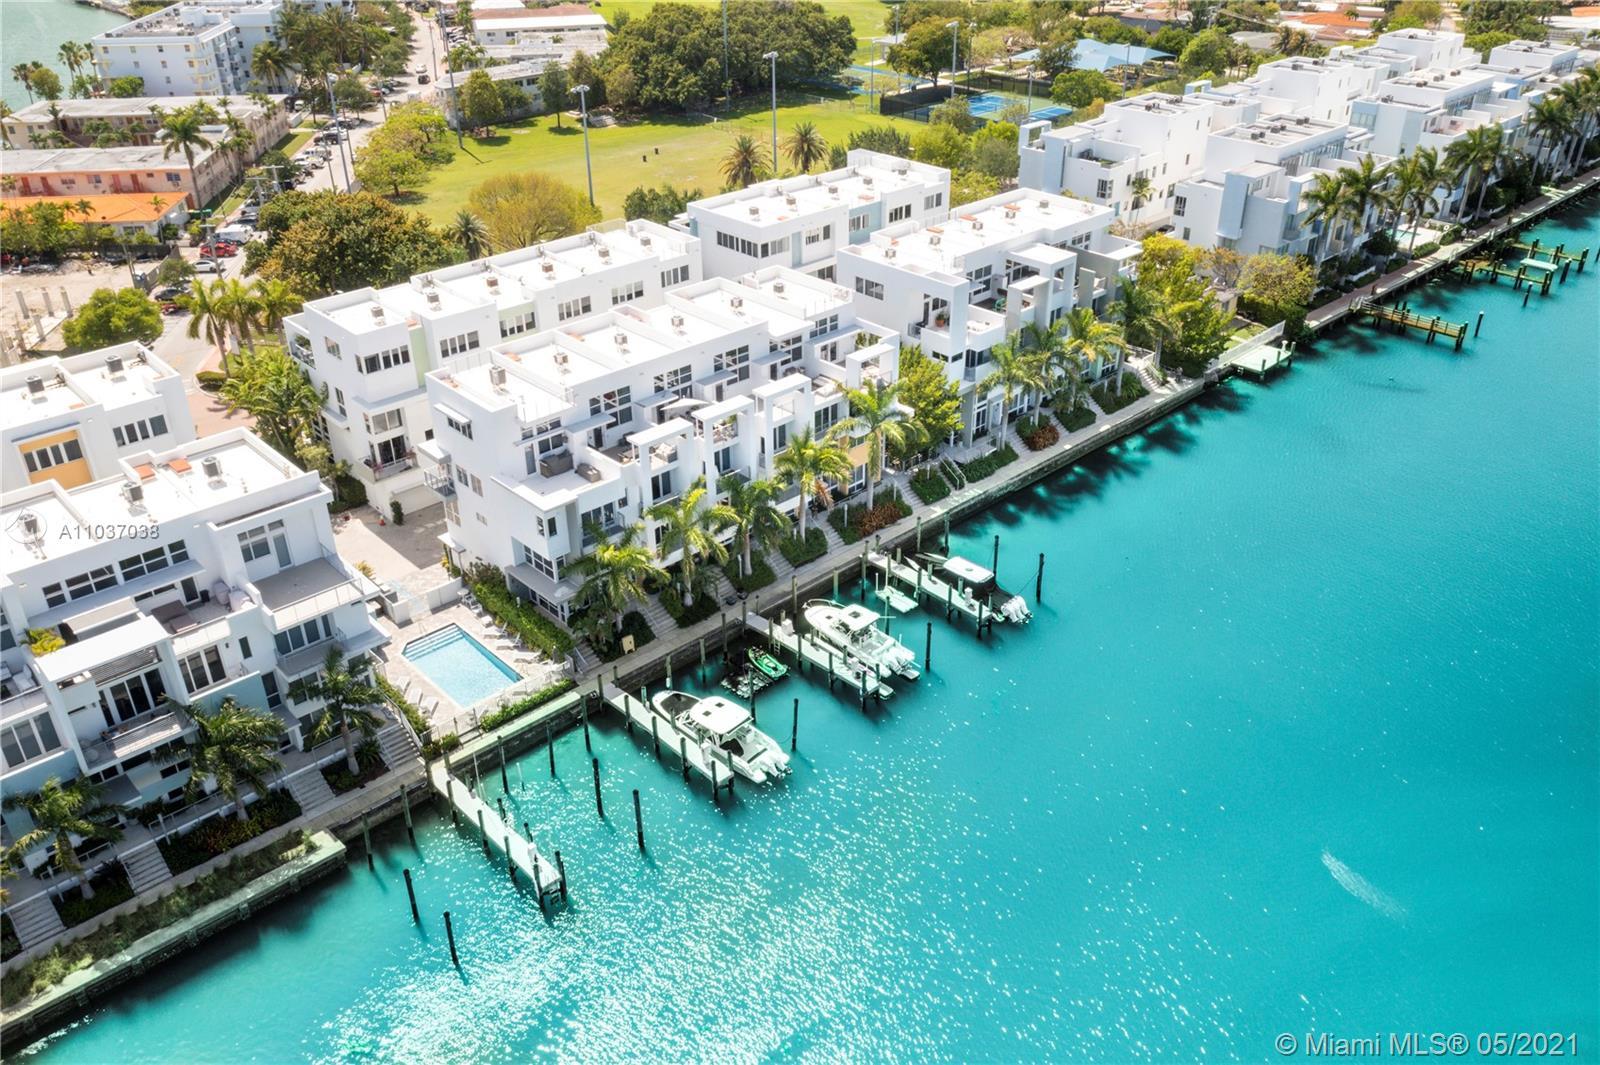 Isle of Normandy - 97 N Shore Dr, Miami Beach, FL 33141